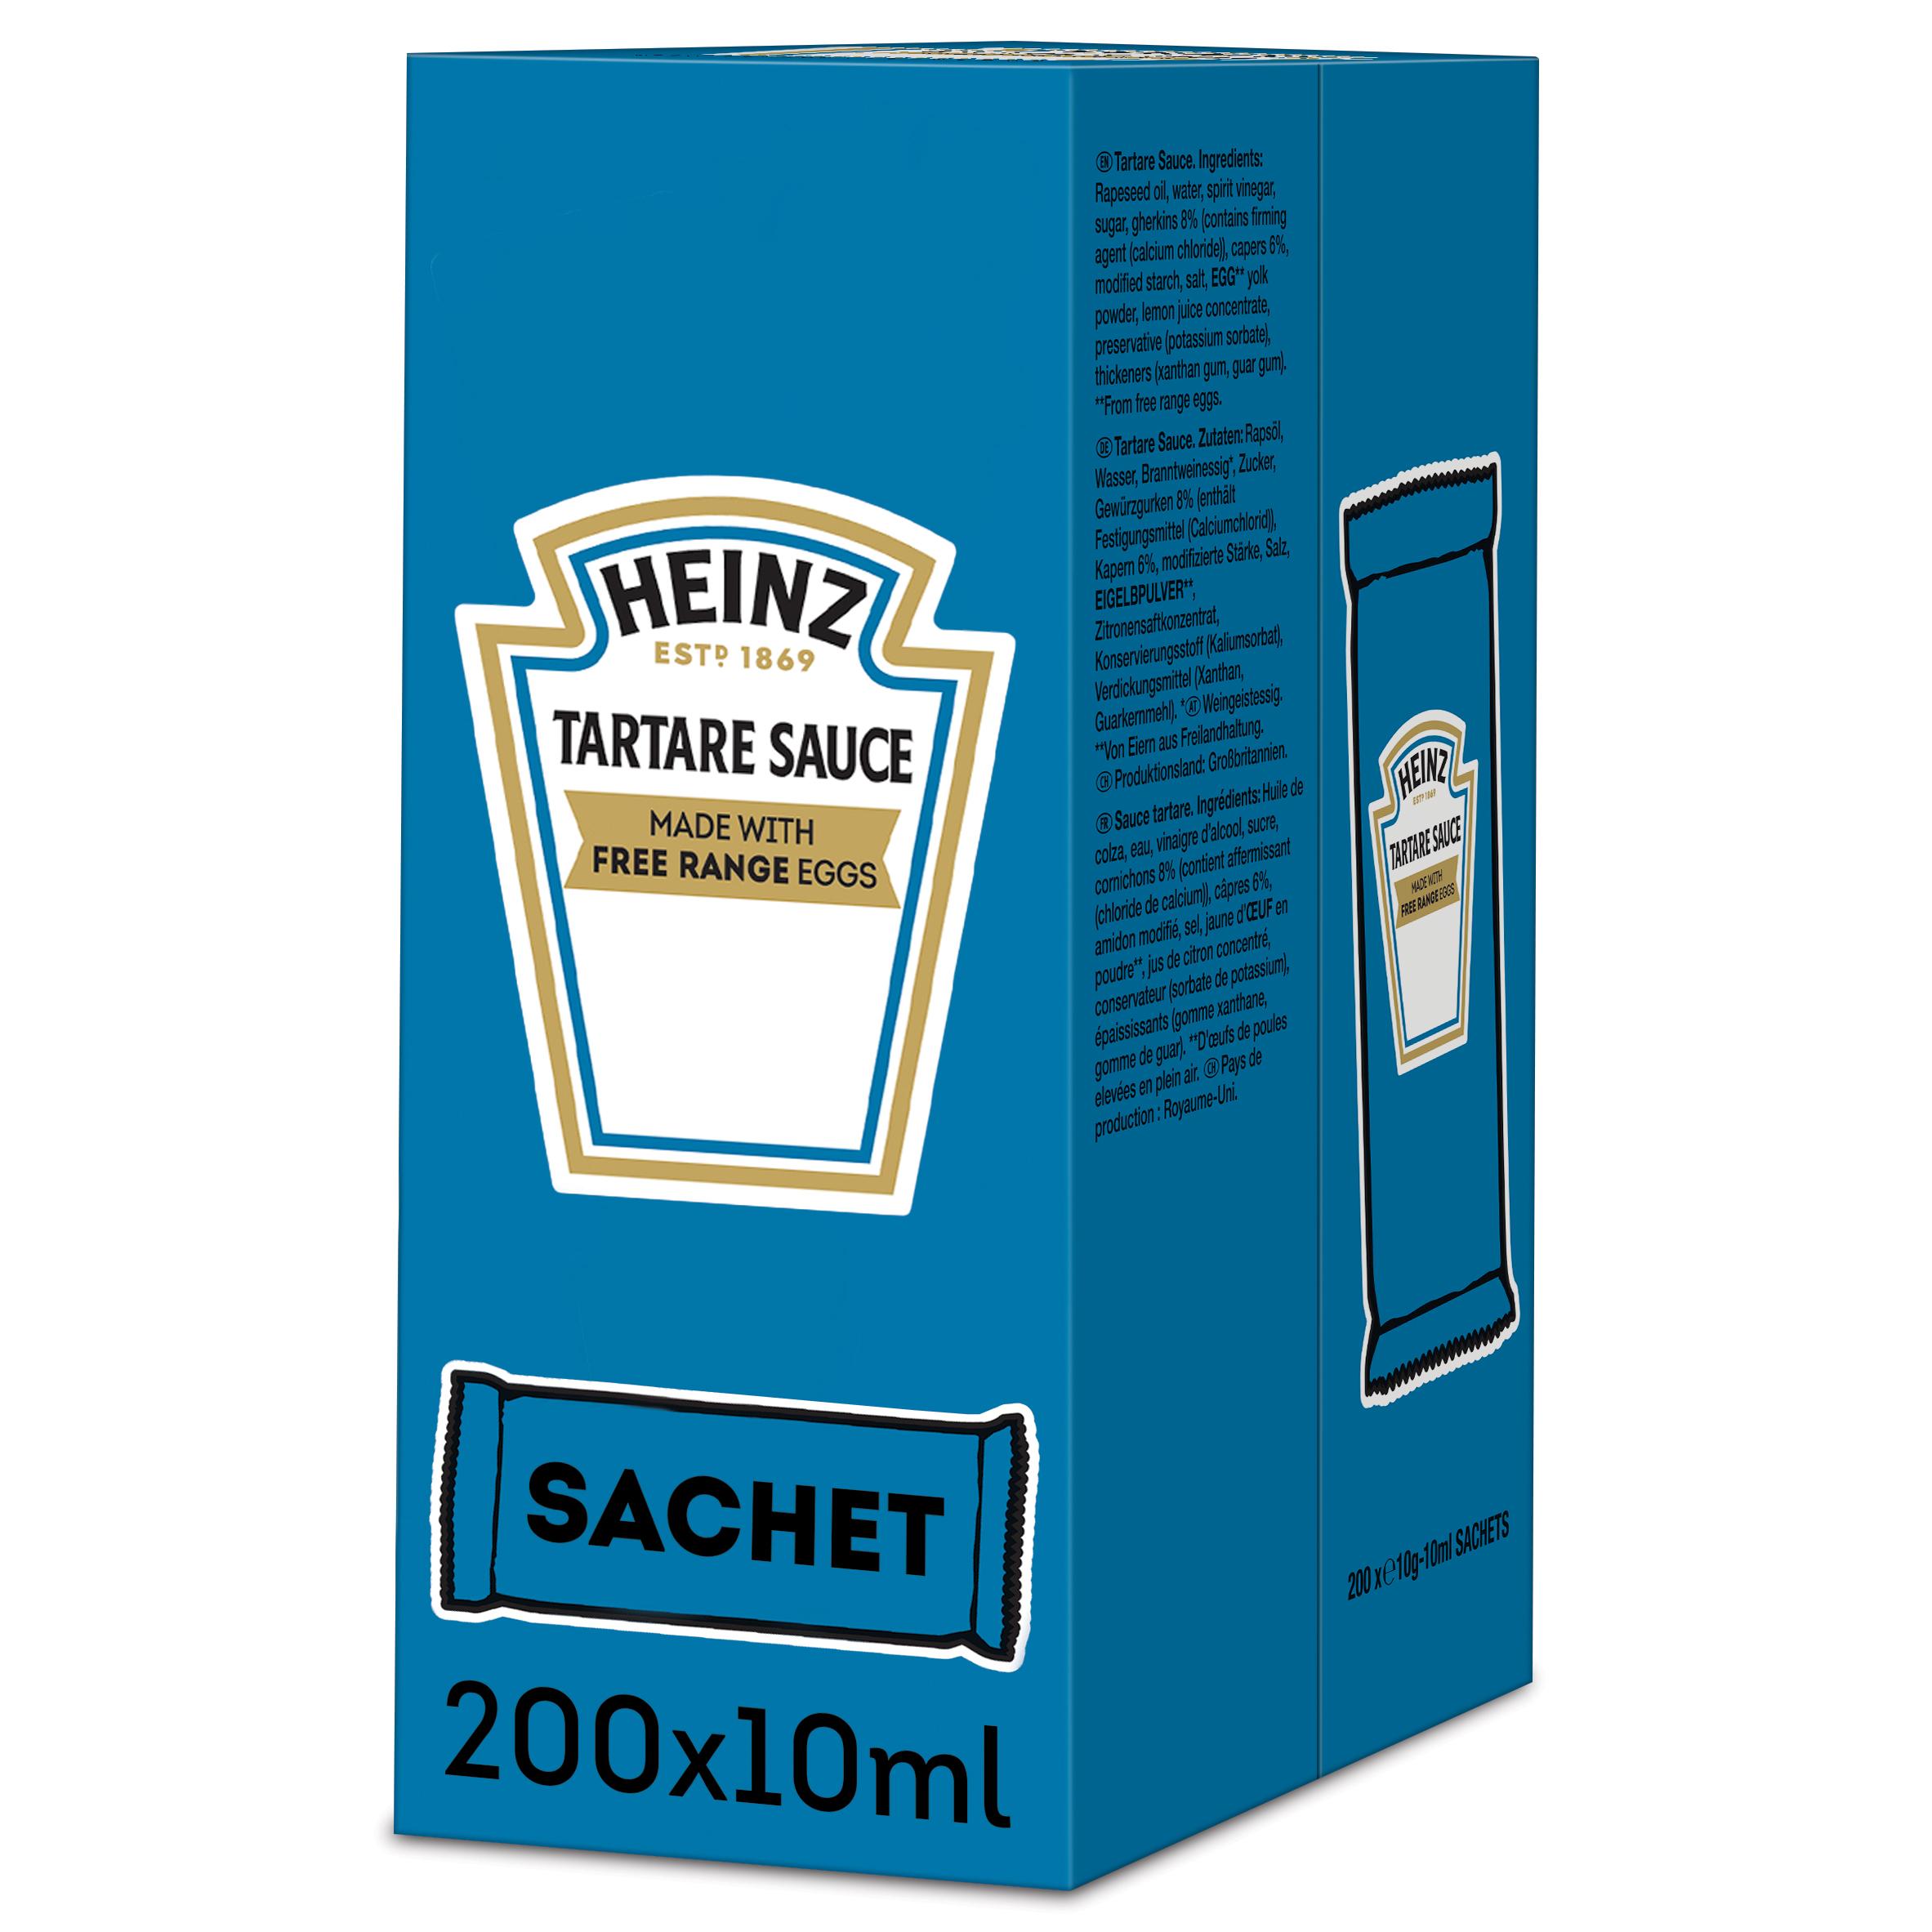 Heinz Tartare 10ml Sachet